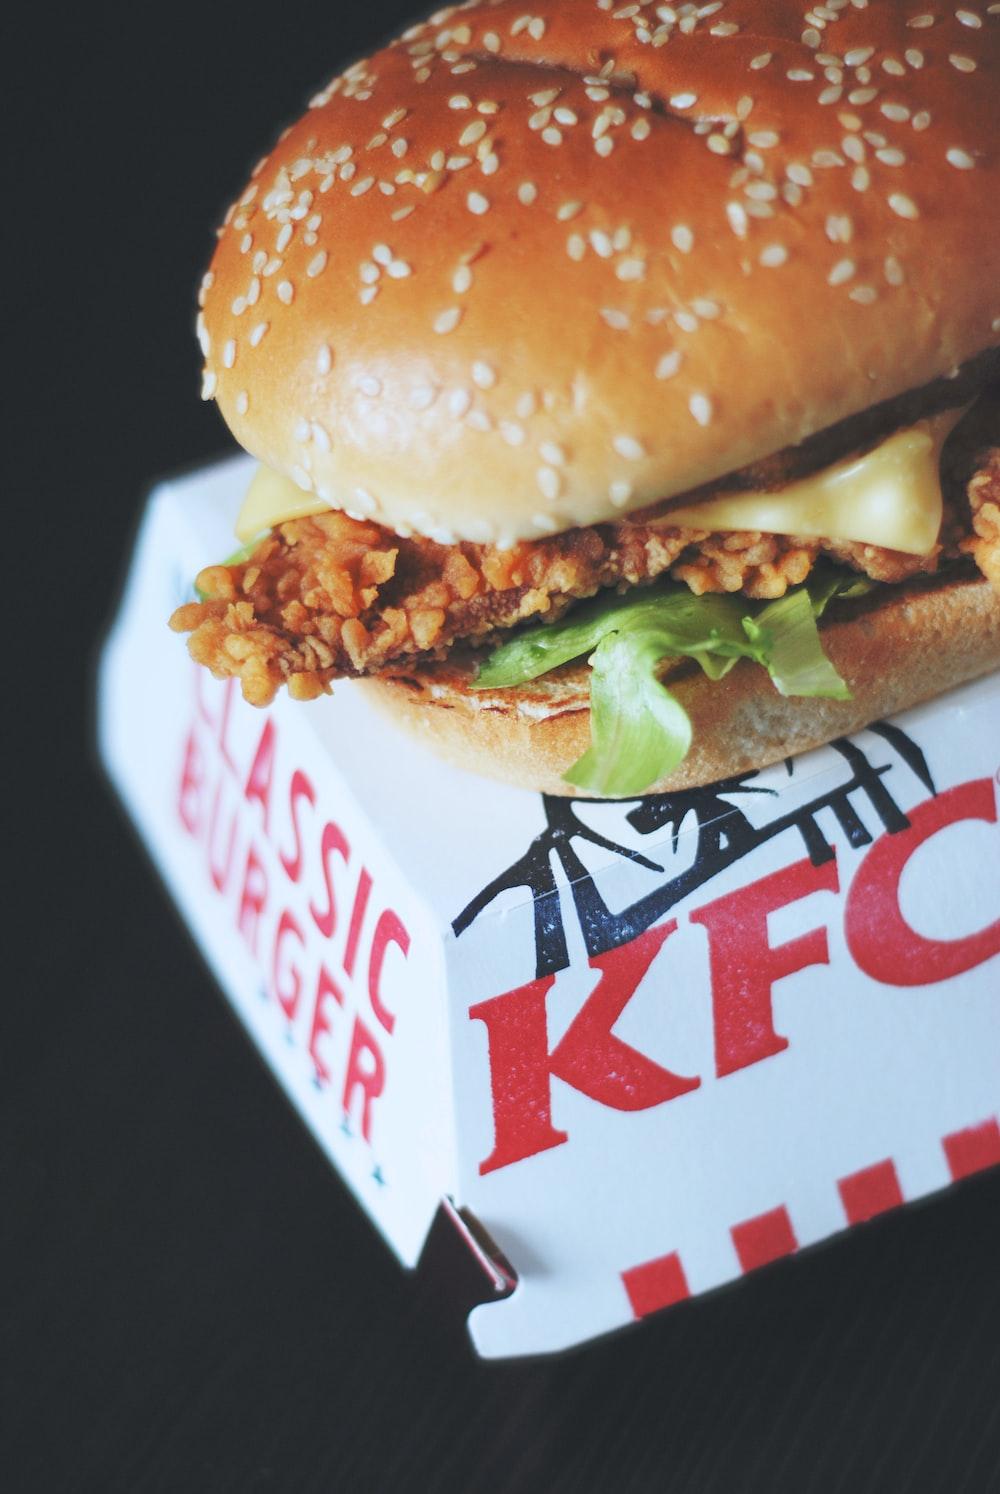 Zinger Tower Burger Pictures | Download Free Images on Unsplash